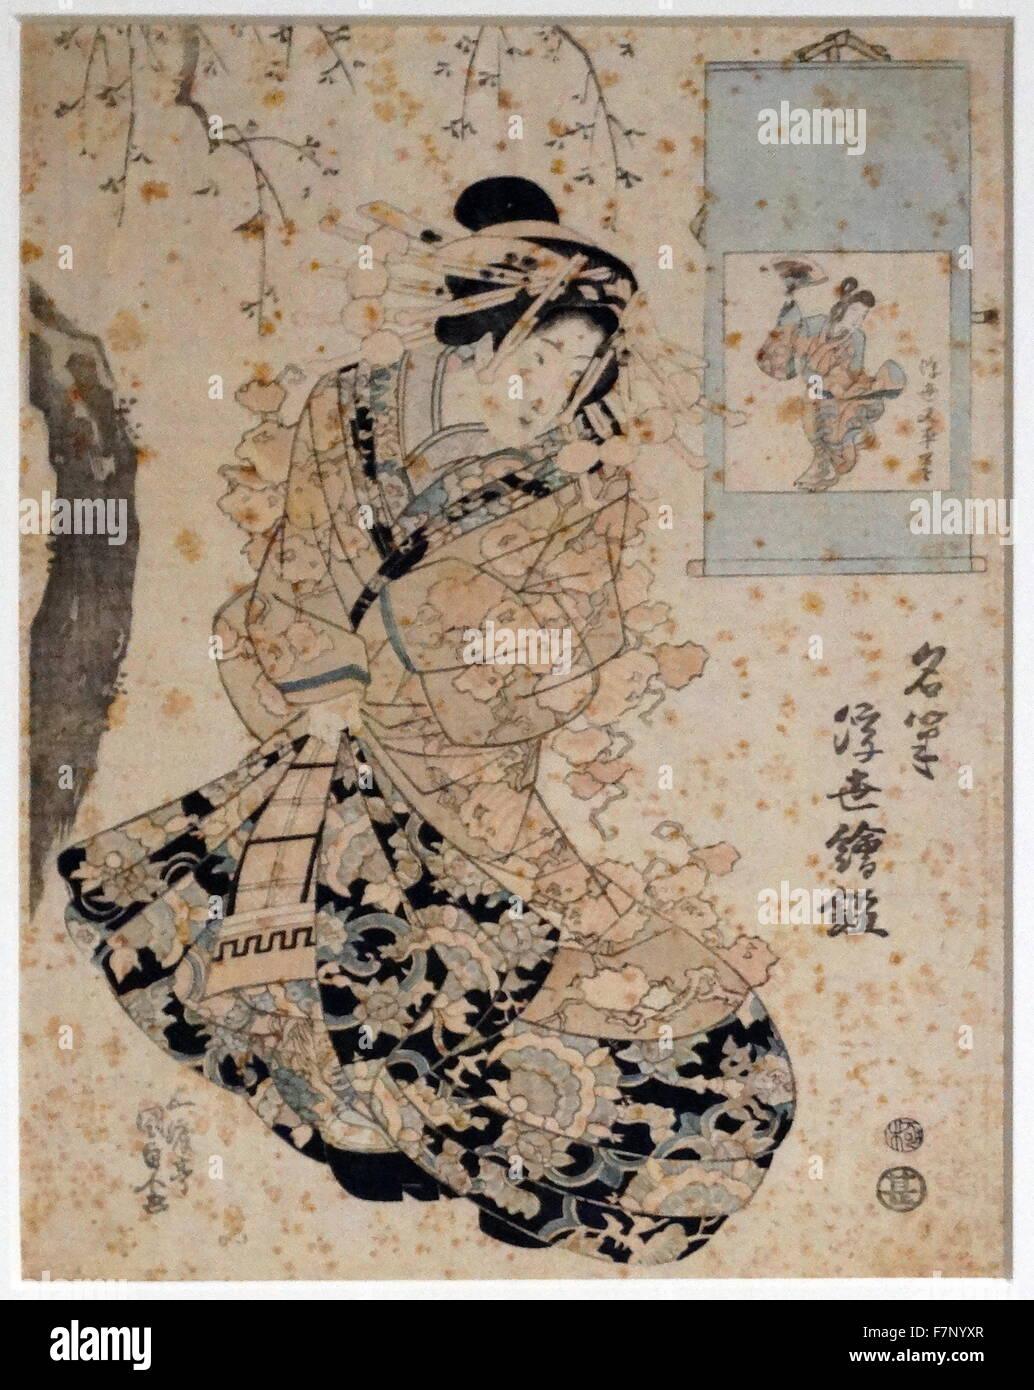 Ukiyo Matabei (Meishitsu ukiyo-e kagami) by Utagawa Kunisada (1786-1865) Japanese designer of ukiyo-e woodblock - Stock Image